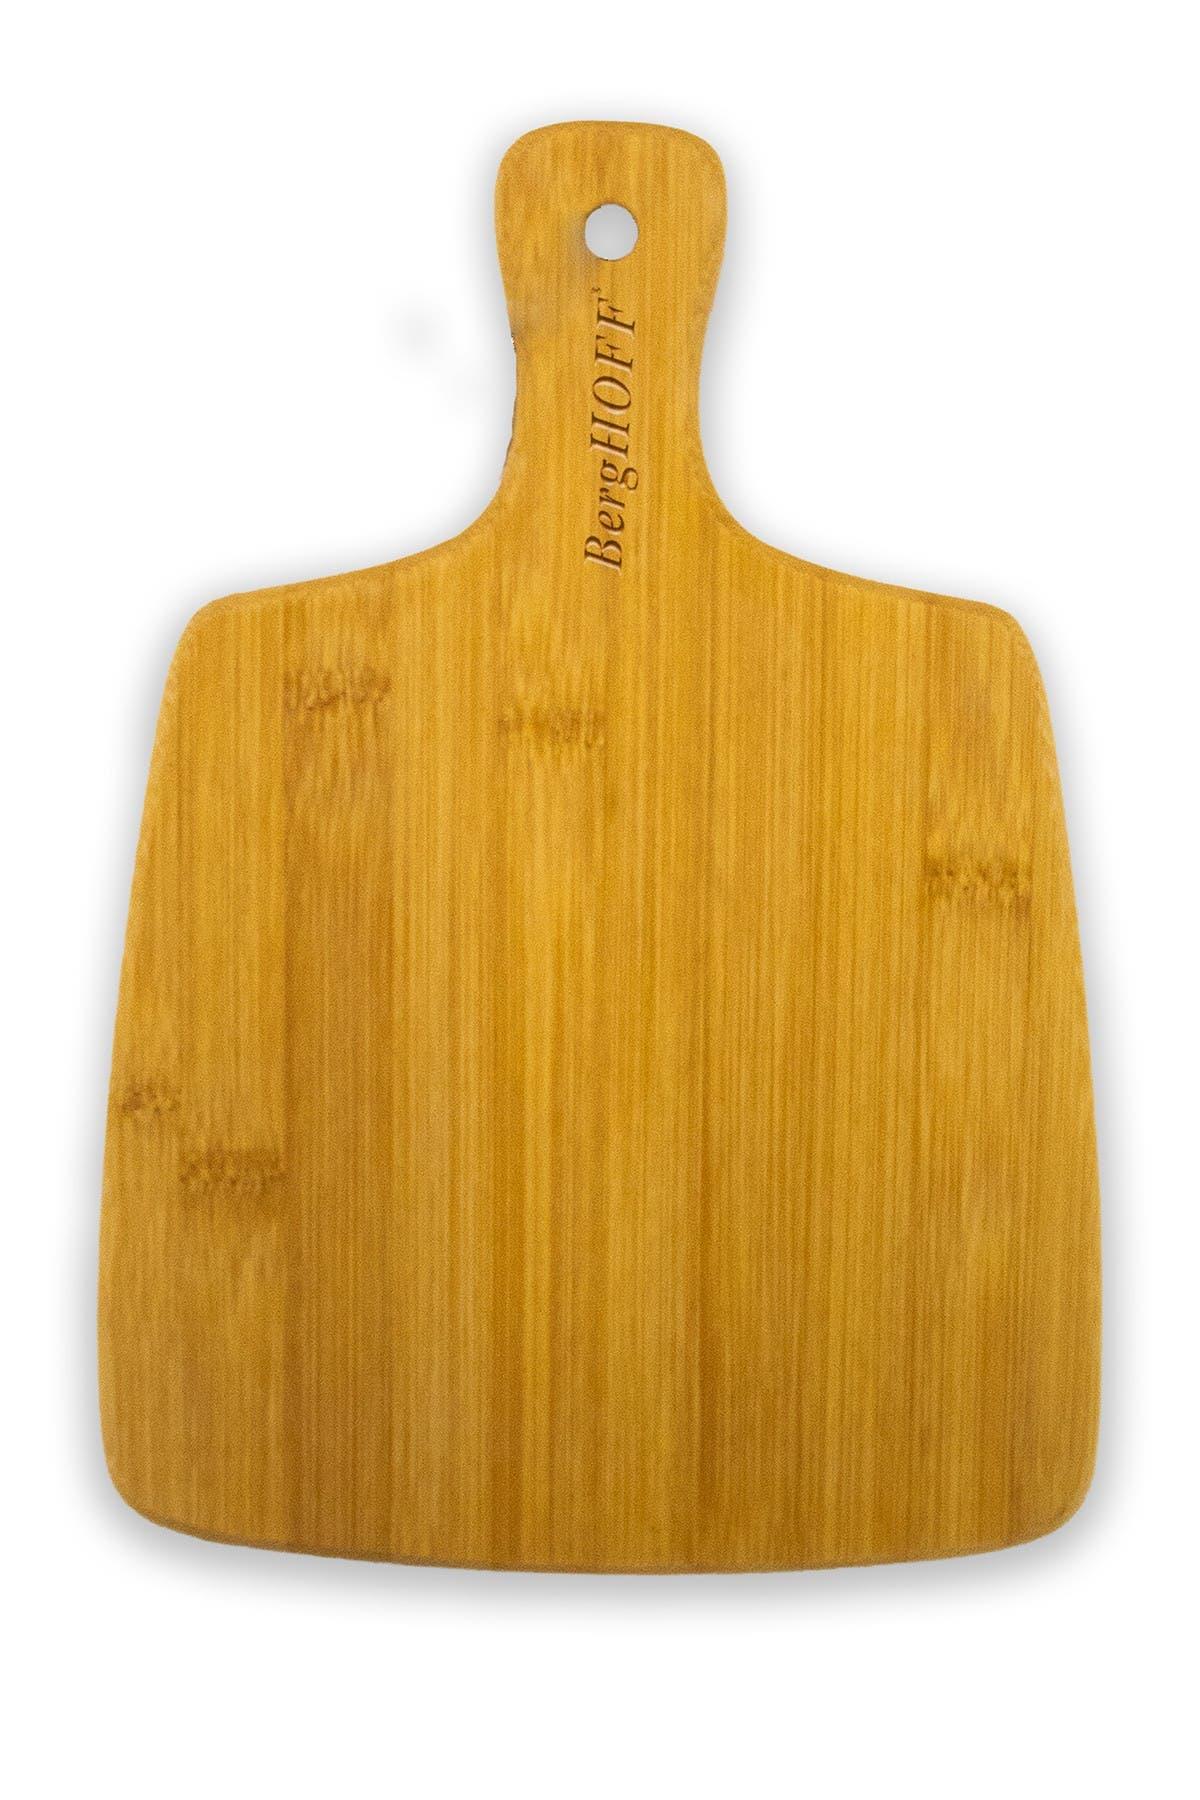 Image of BergHOFF Bamboo Paddle Cutting Board